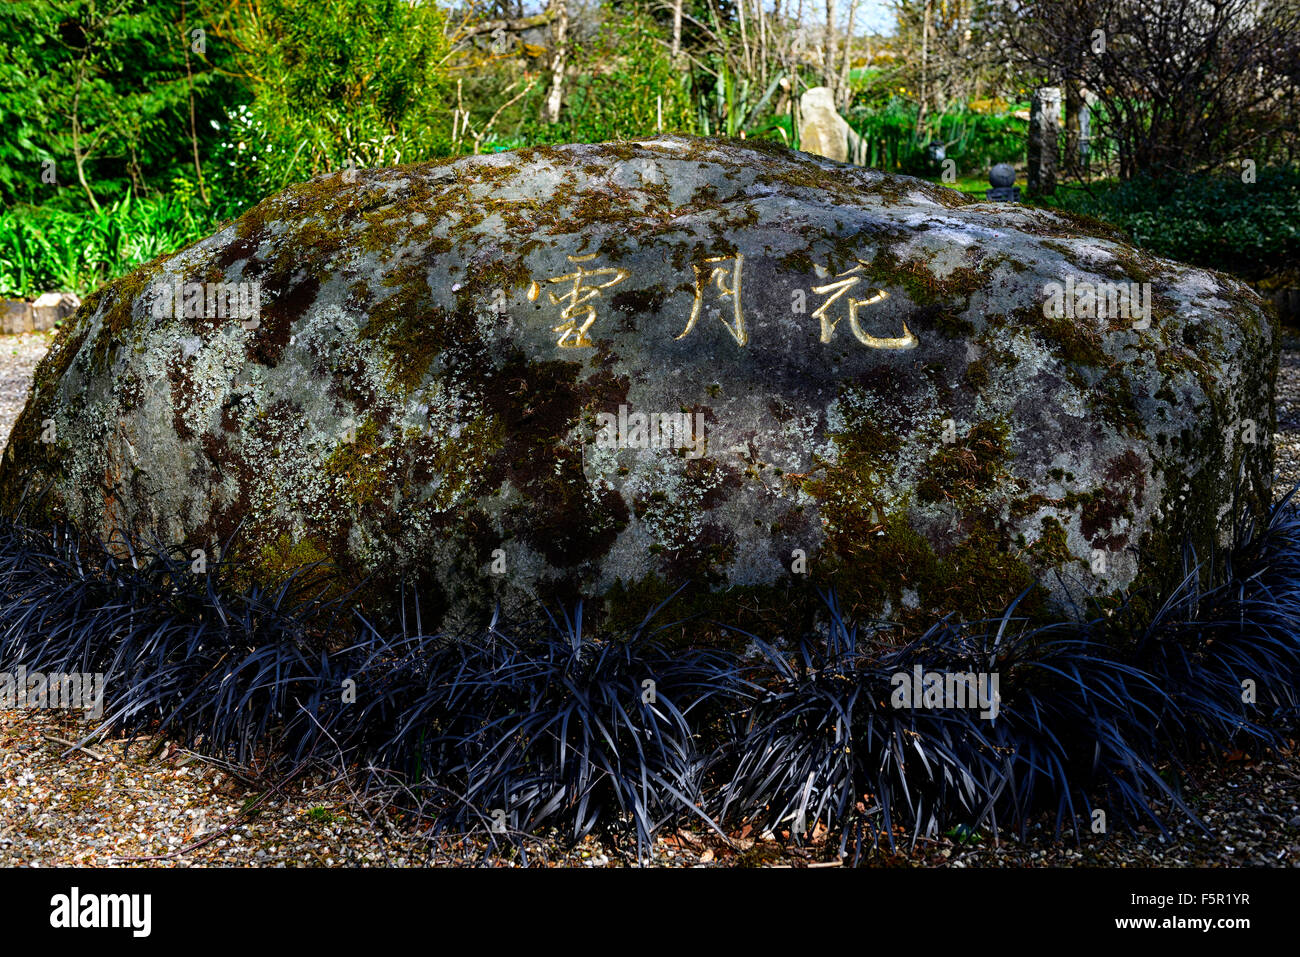 Kanji Snow Moon Flowers characters writing written boulder Knockanree Garden Wicklow Ireland garden feature RM Floral - Stock Image